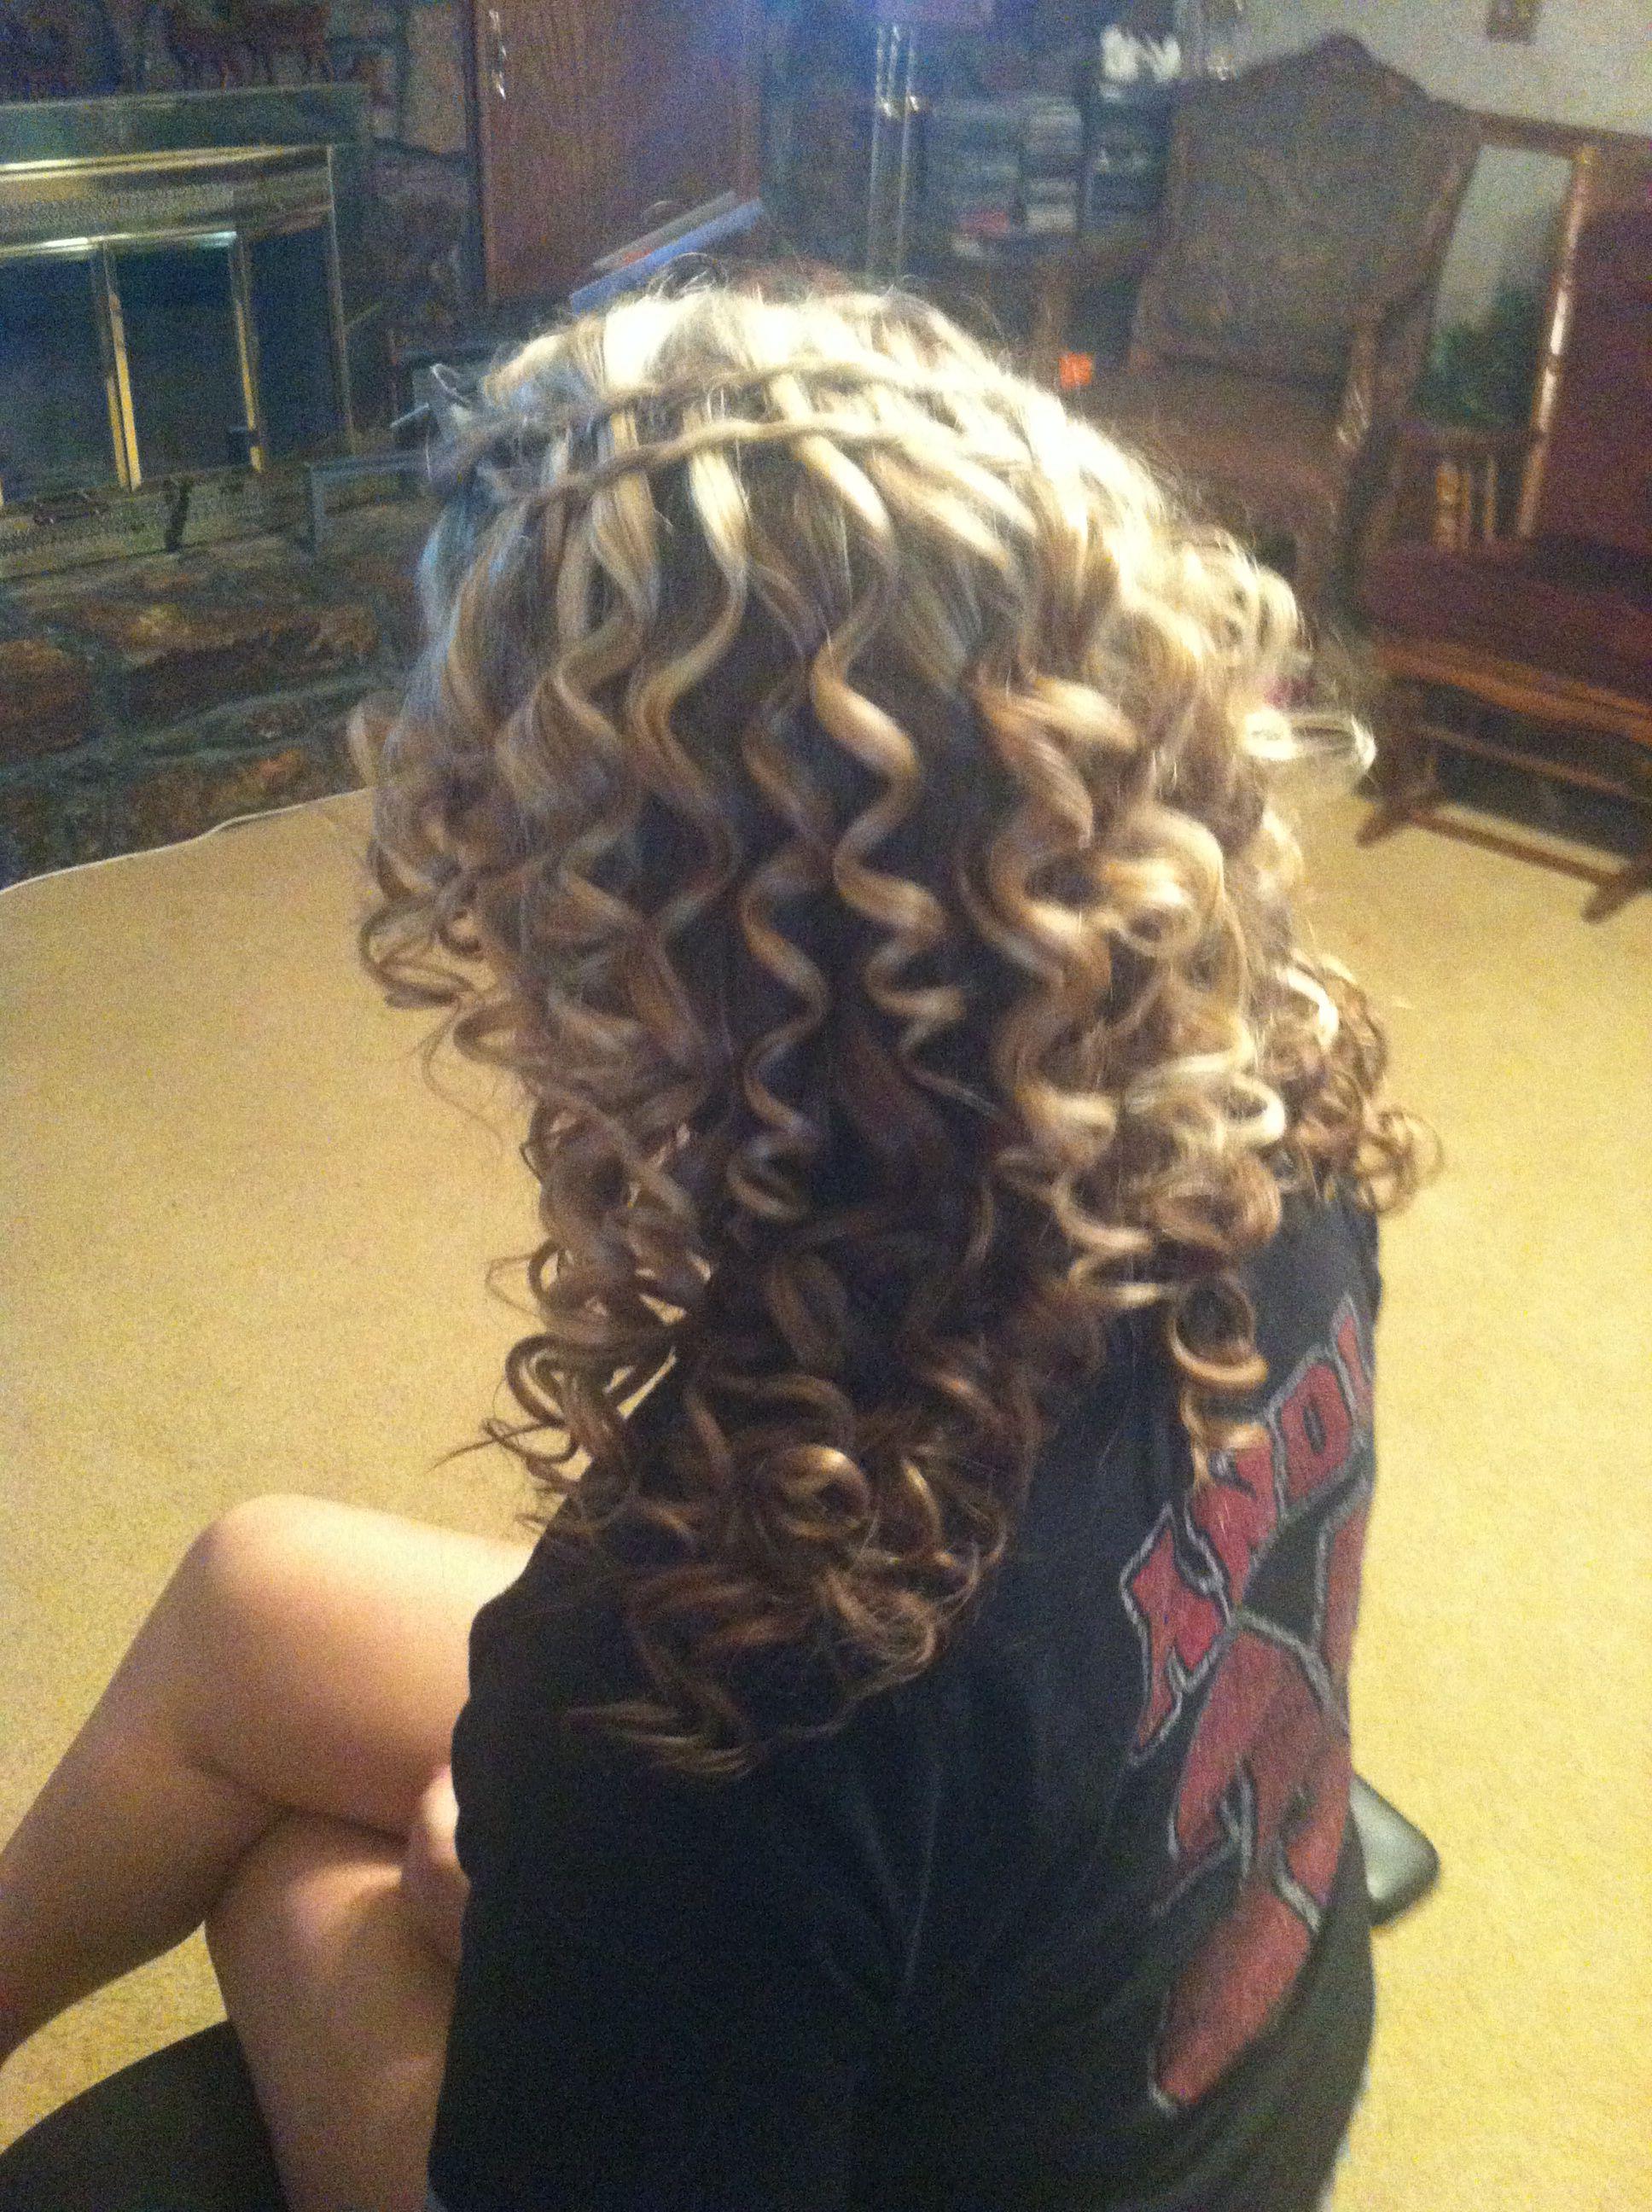 Prom hair curls braid down very very curly love it prom hair